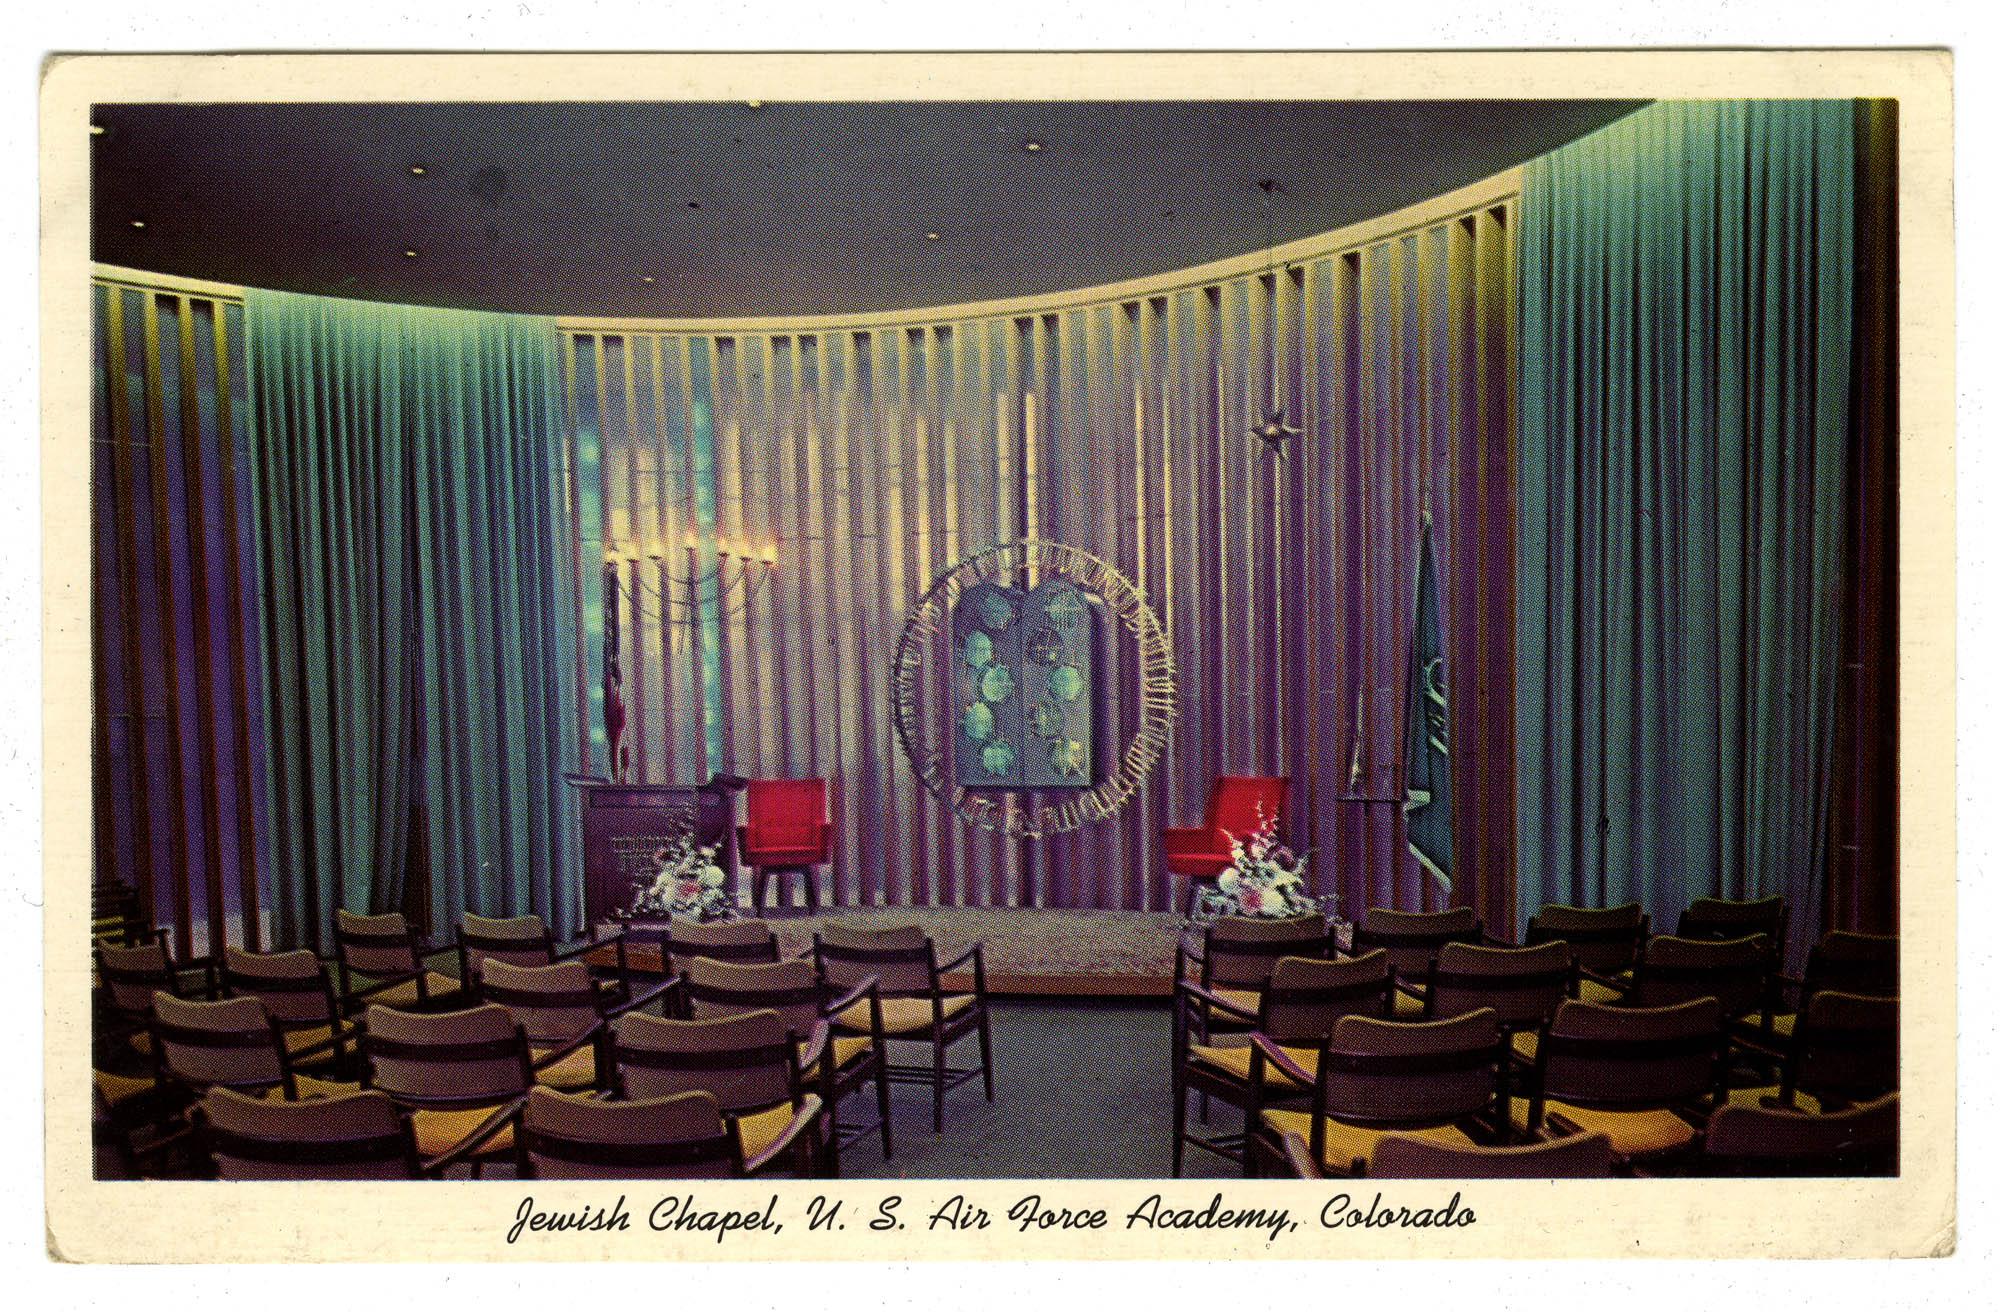 Jewish Chapel, U.S. Air Force Academy, Colorado